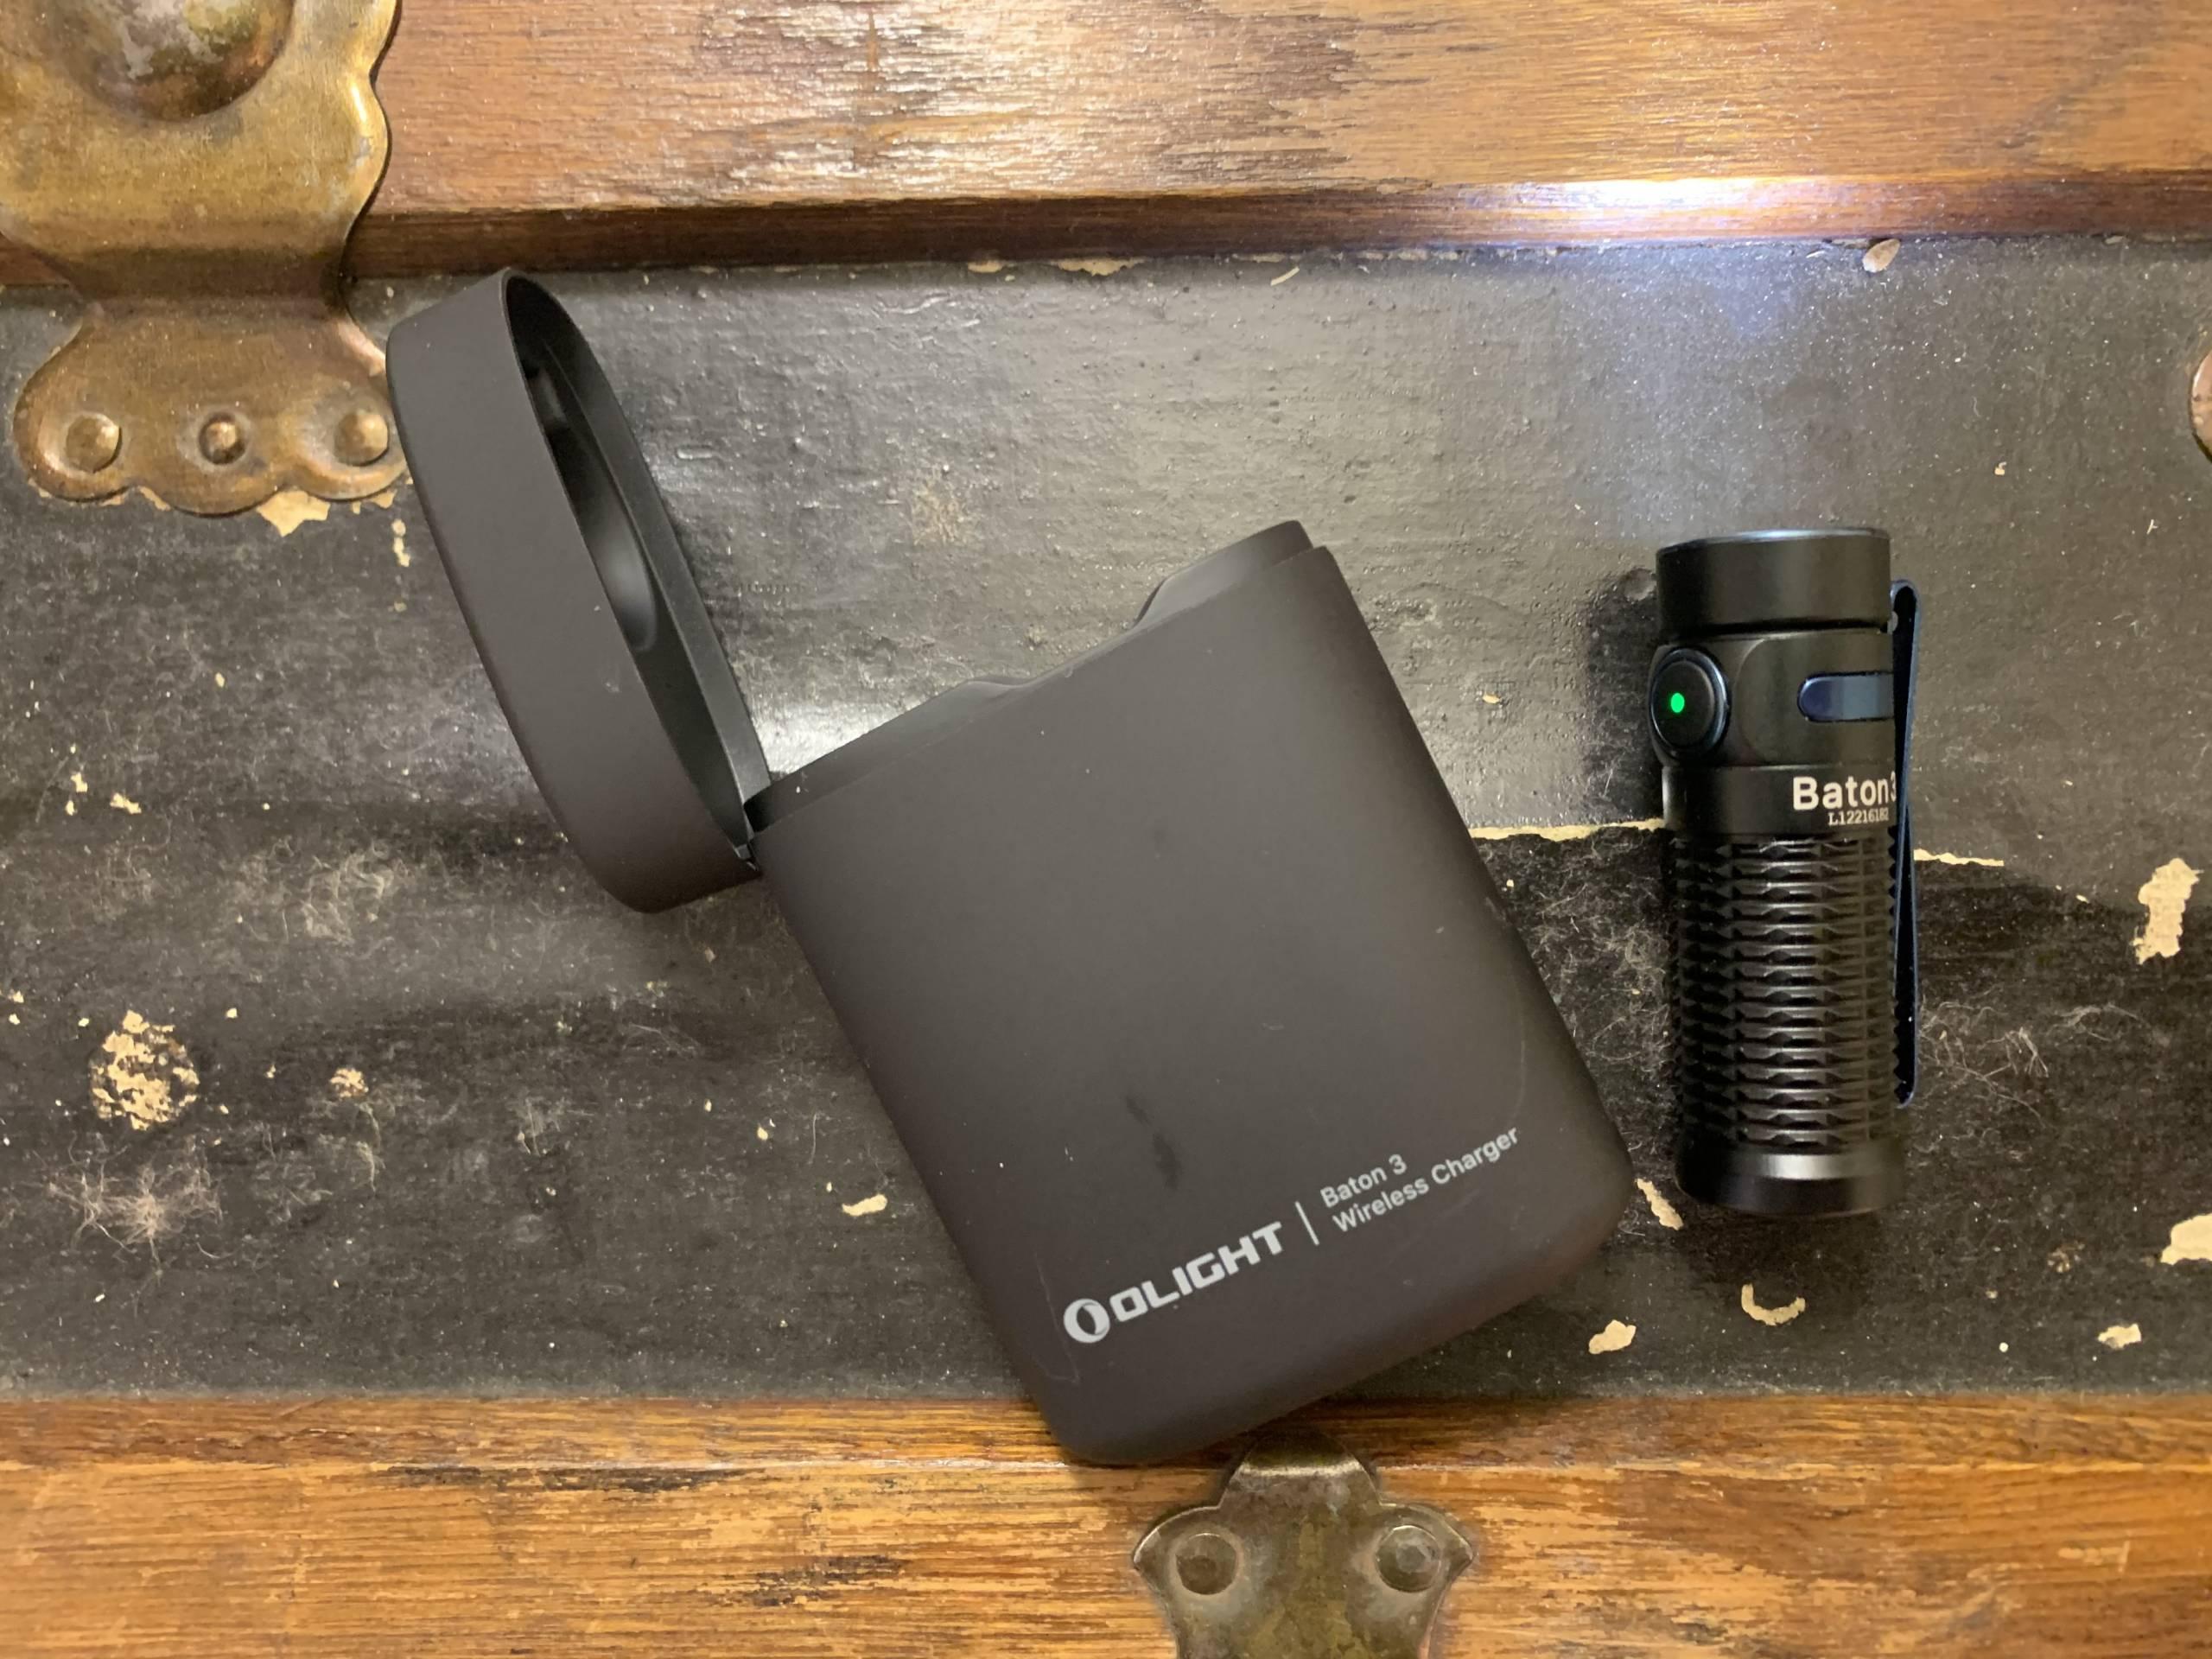 Olight Baton 3 with charging case